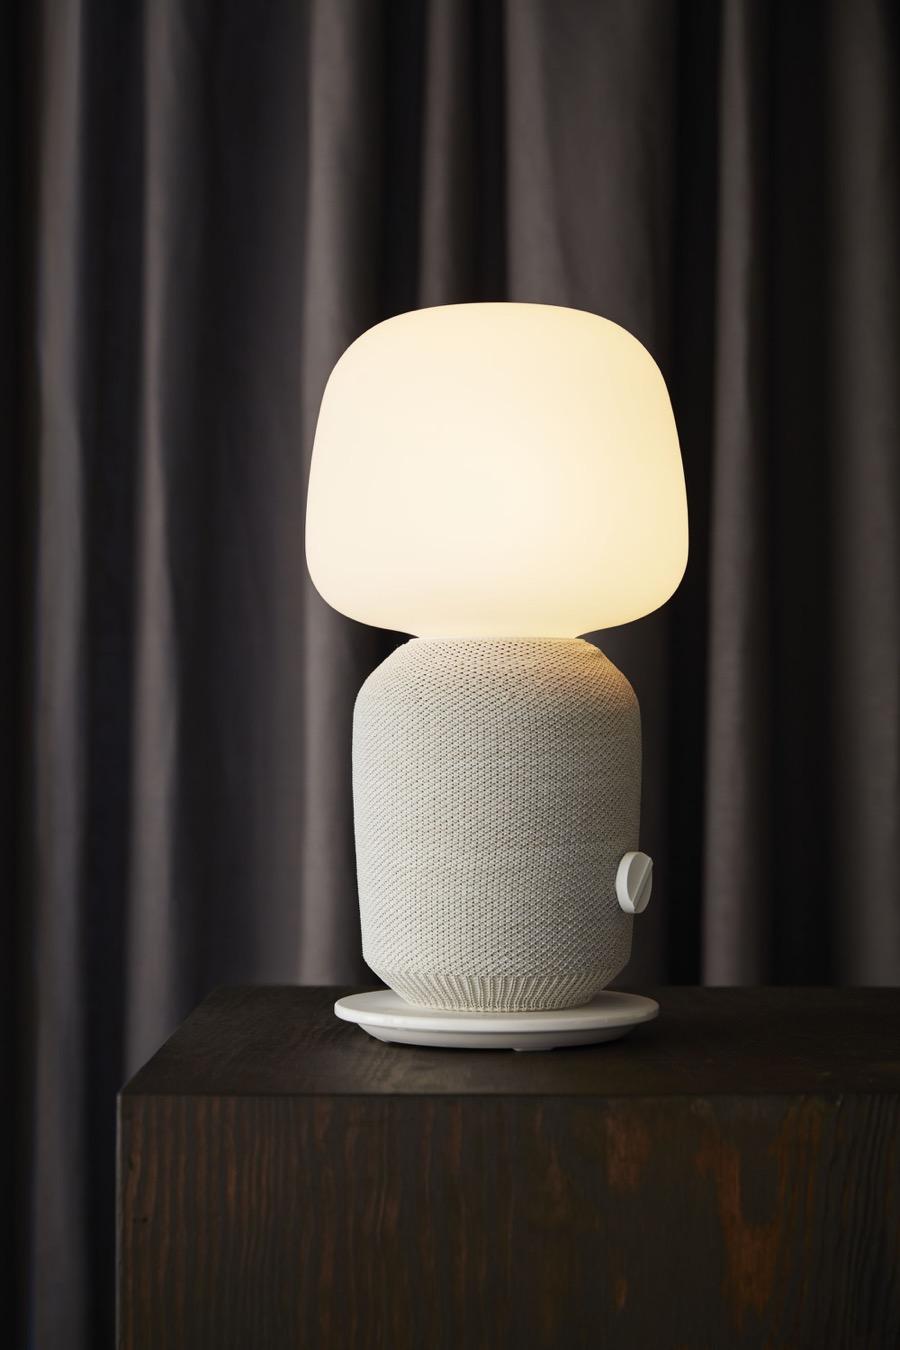 Ikea_nowykatalog_2019_DesignAlive - 5